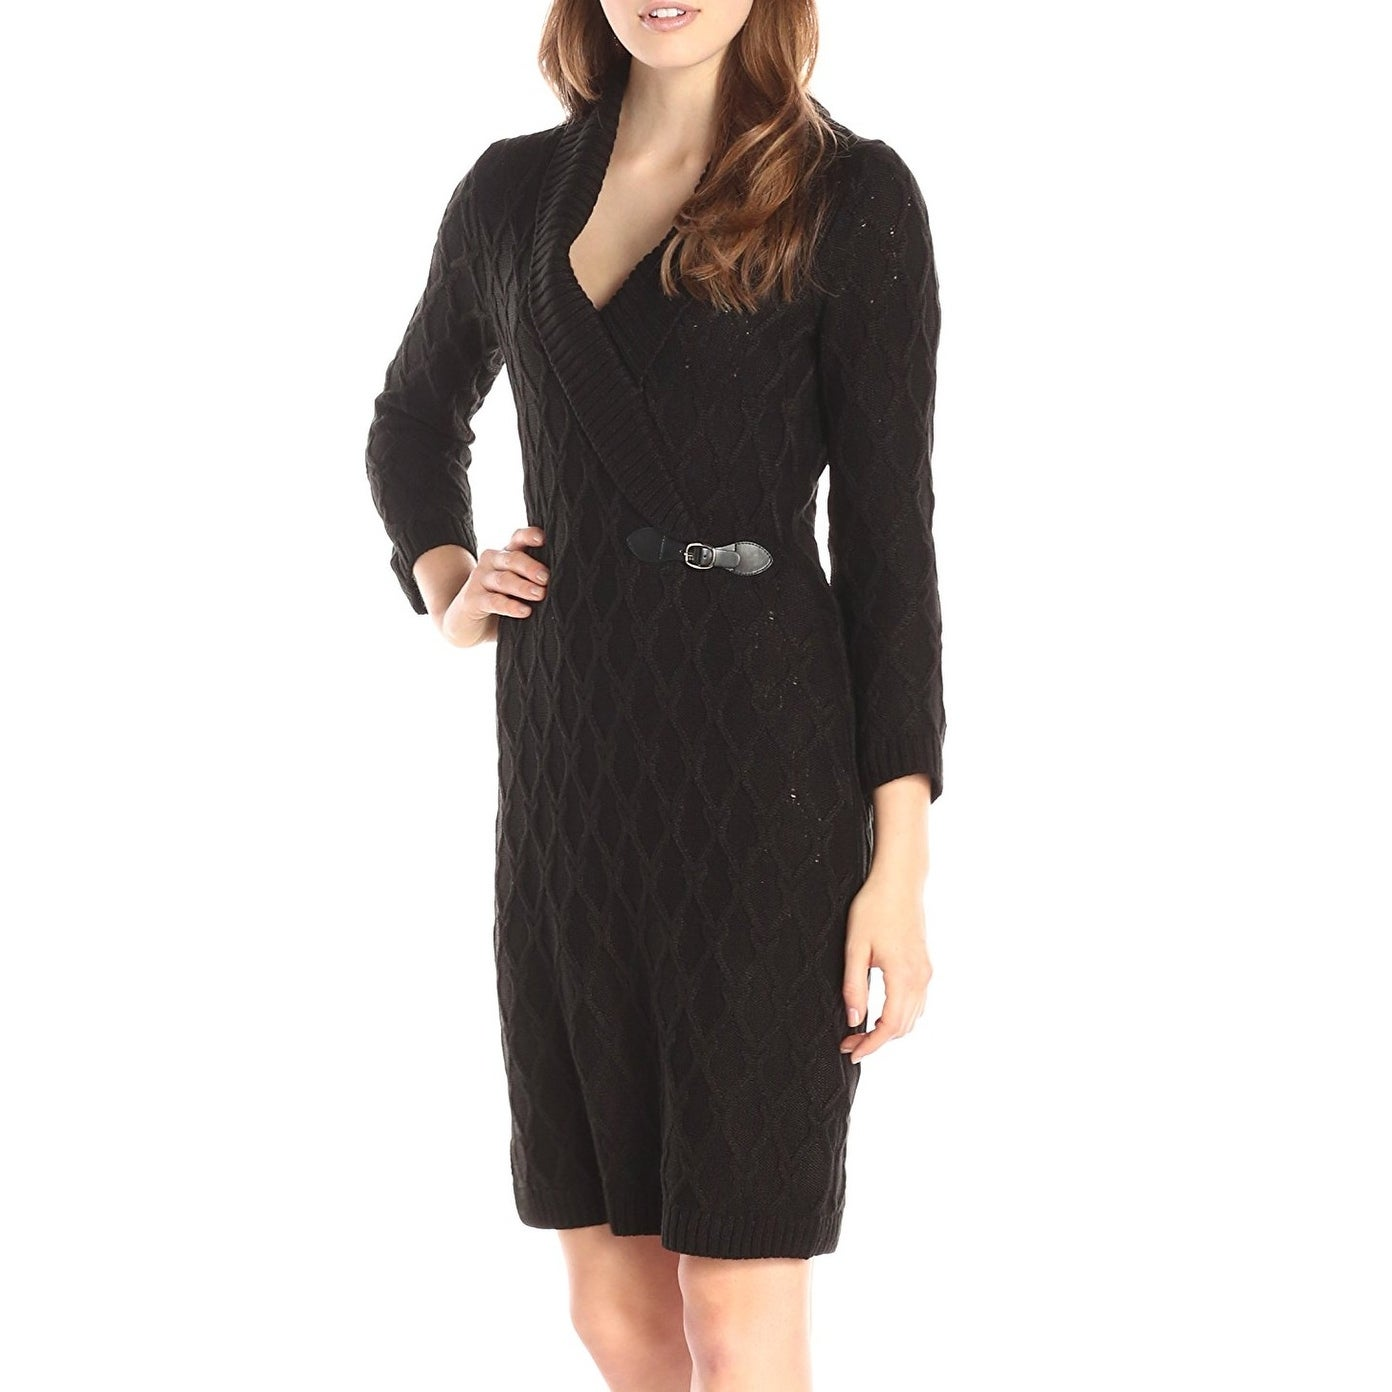 7ae354f958e Acrylic Calvin Klein Dresses